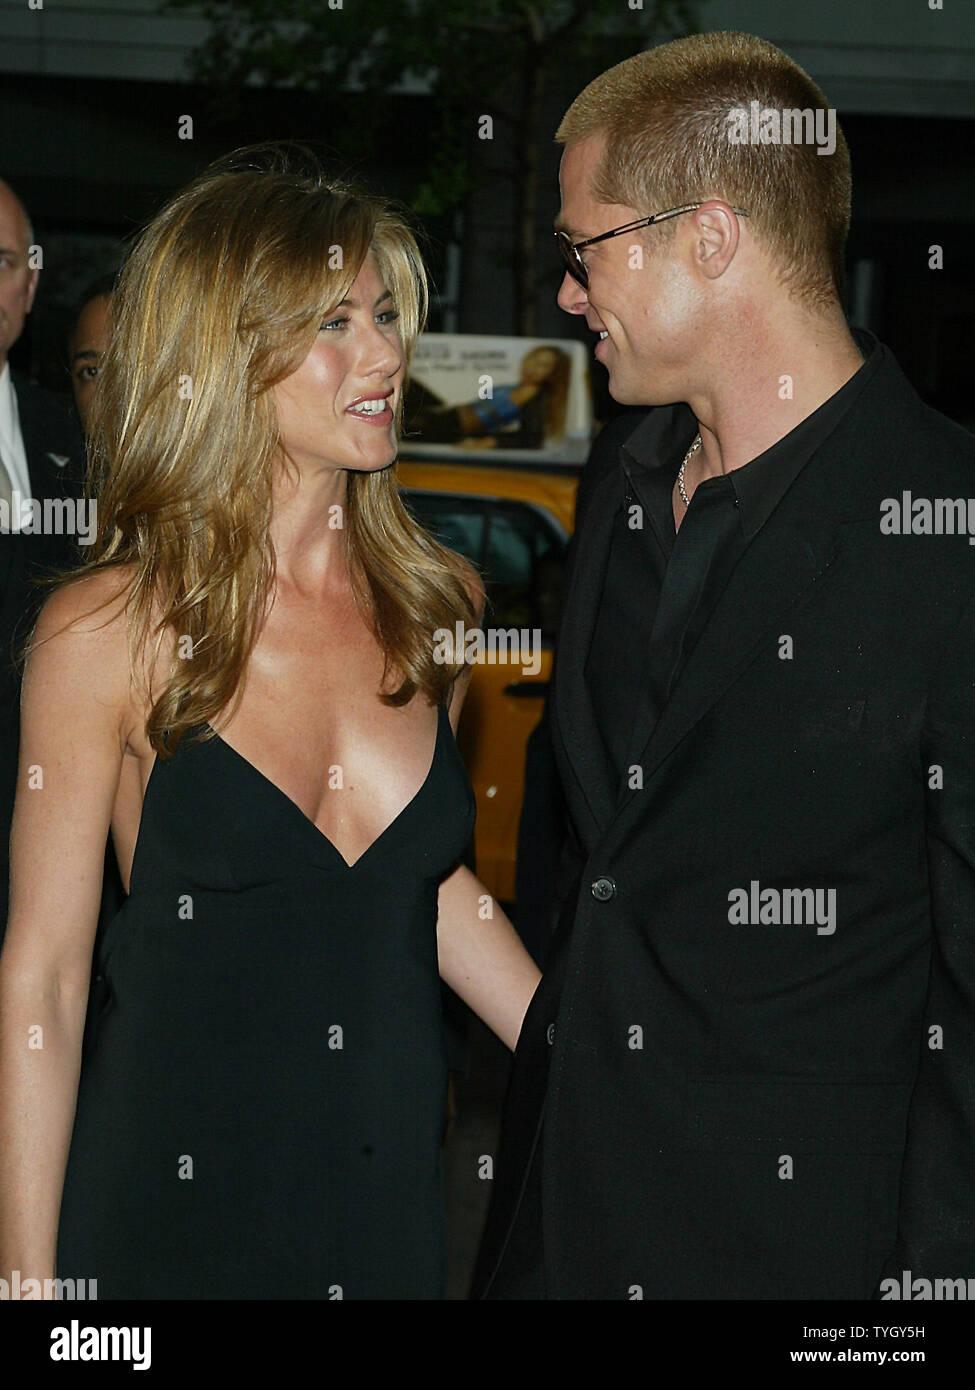 Jennifer Aniston and husband Brad Pitt have reportedly